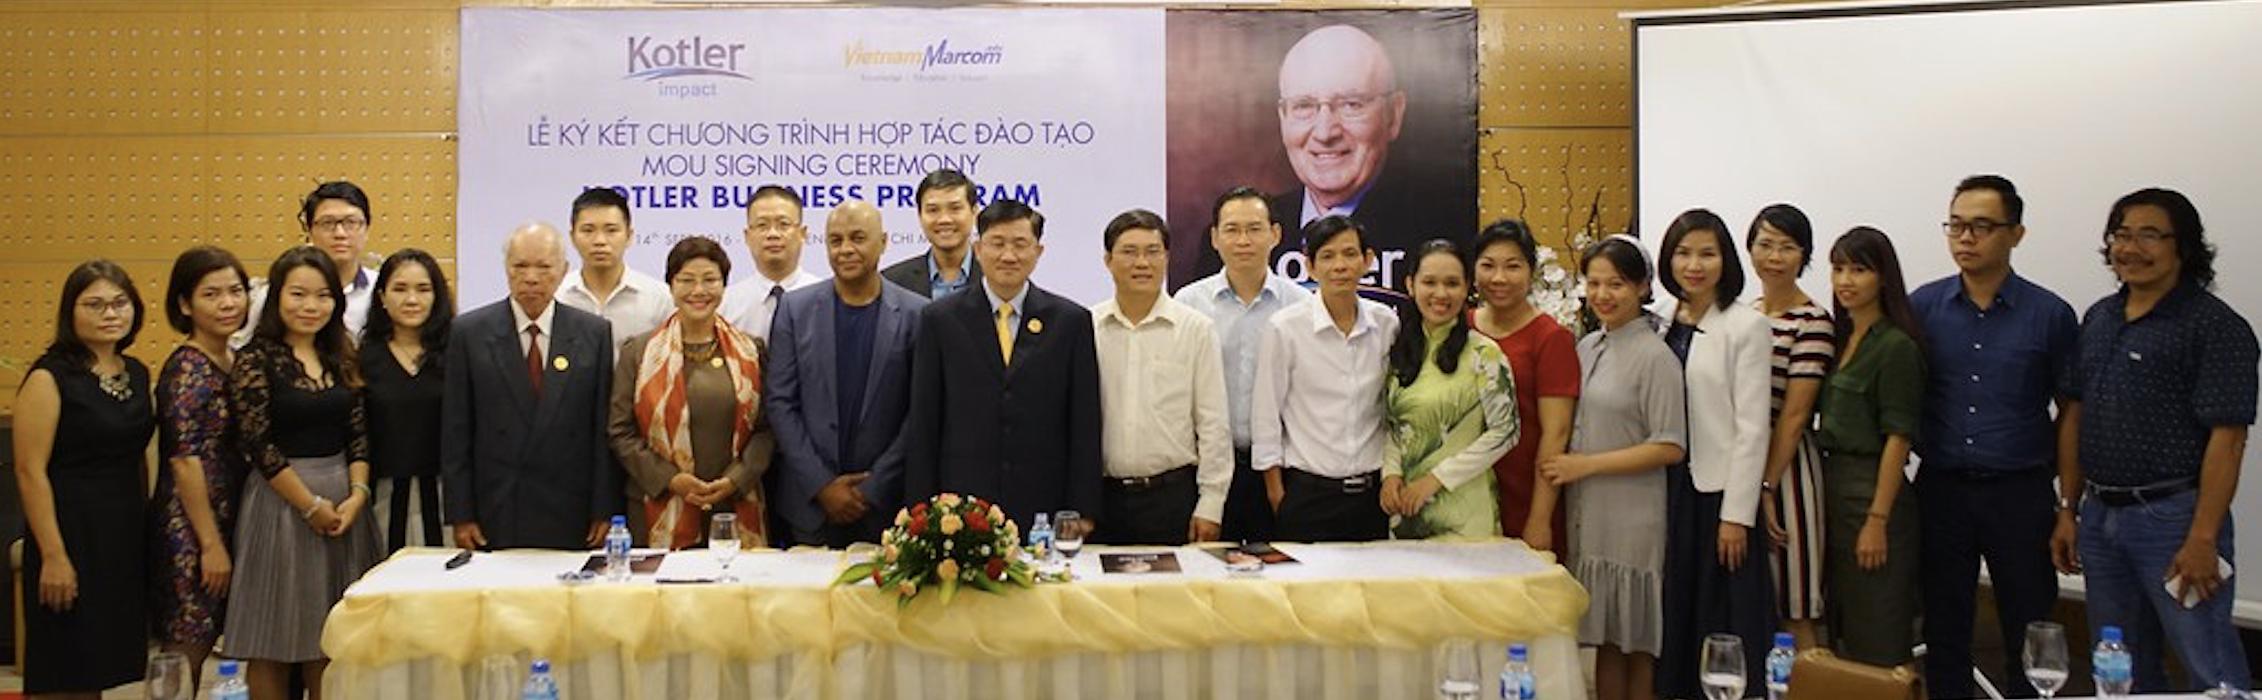 KI and Vietnammarcom